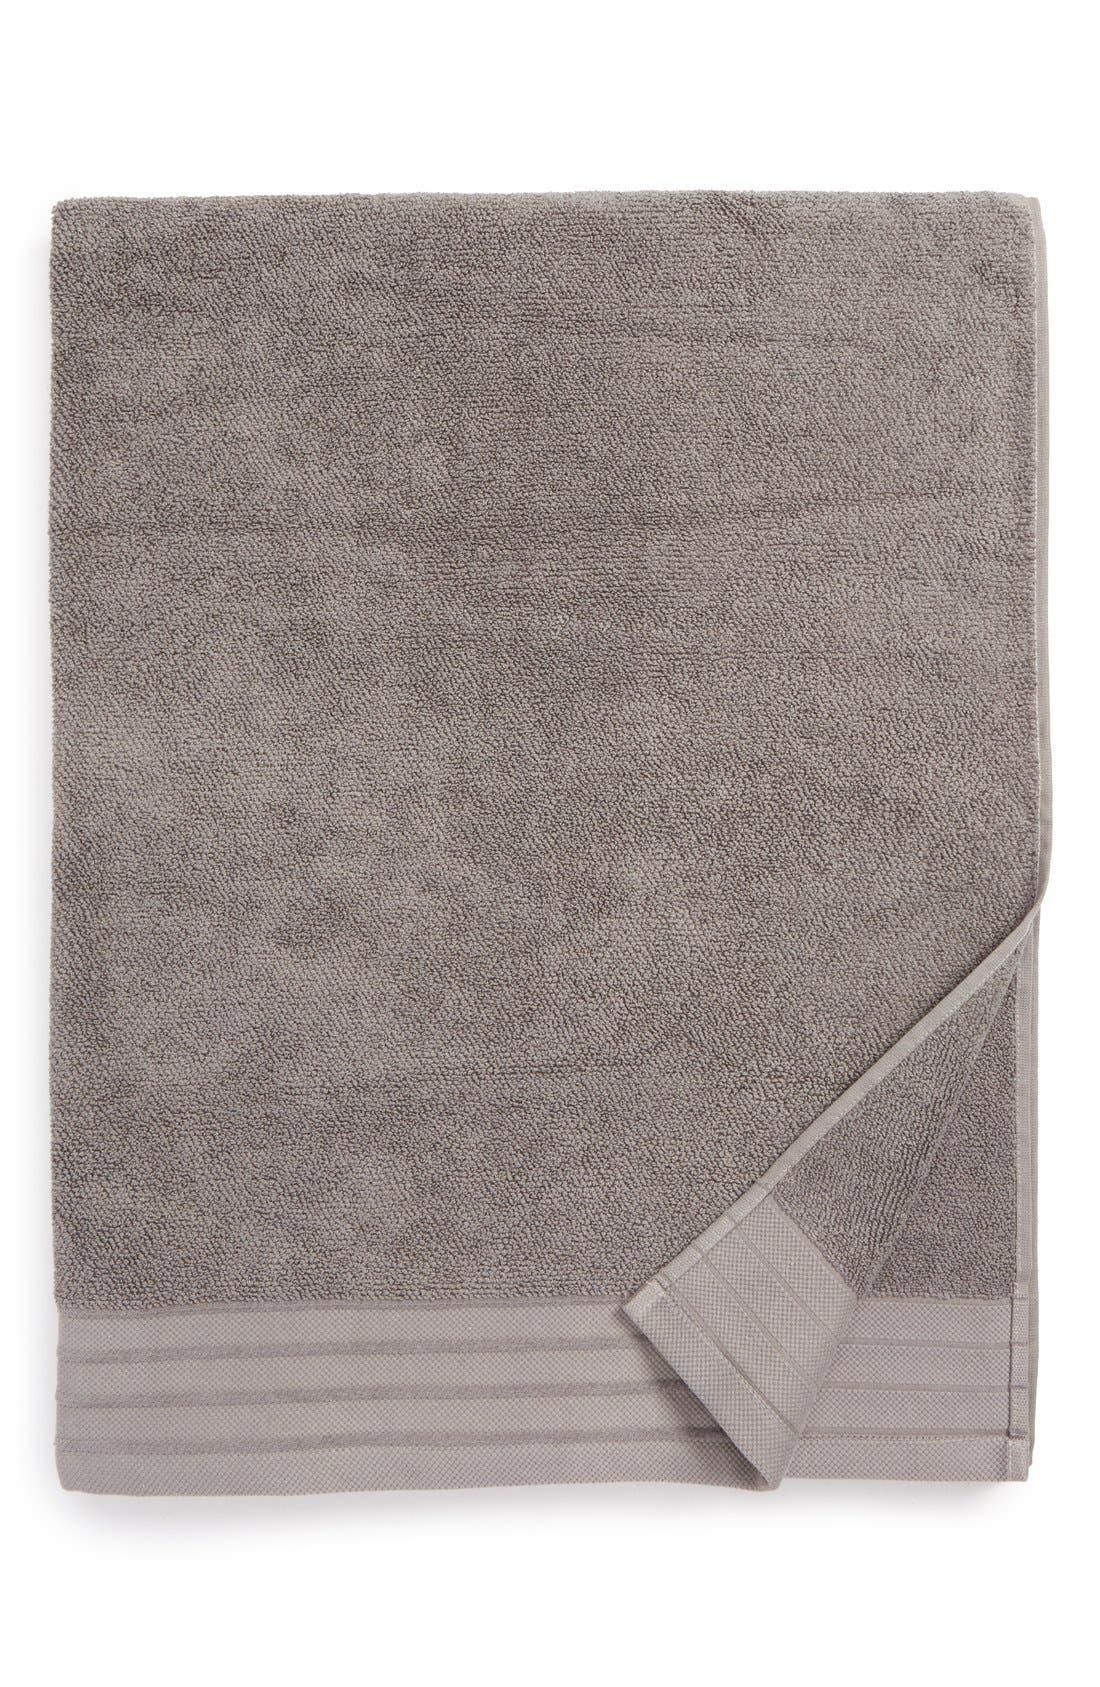 Classic Luxe Cotton Bath Sheet,                             Main thumbnail 1, color,                             GRANITE